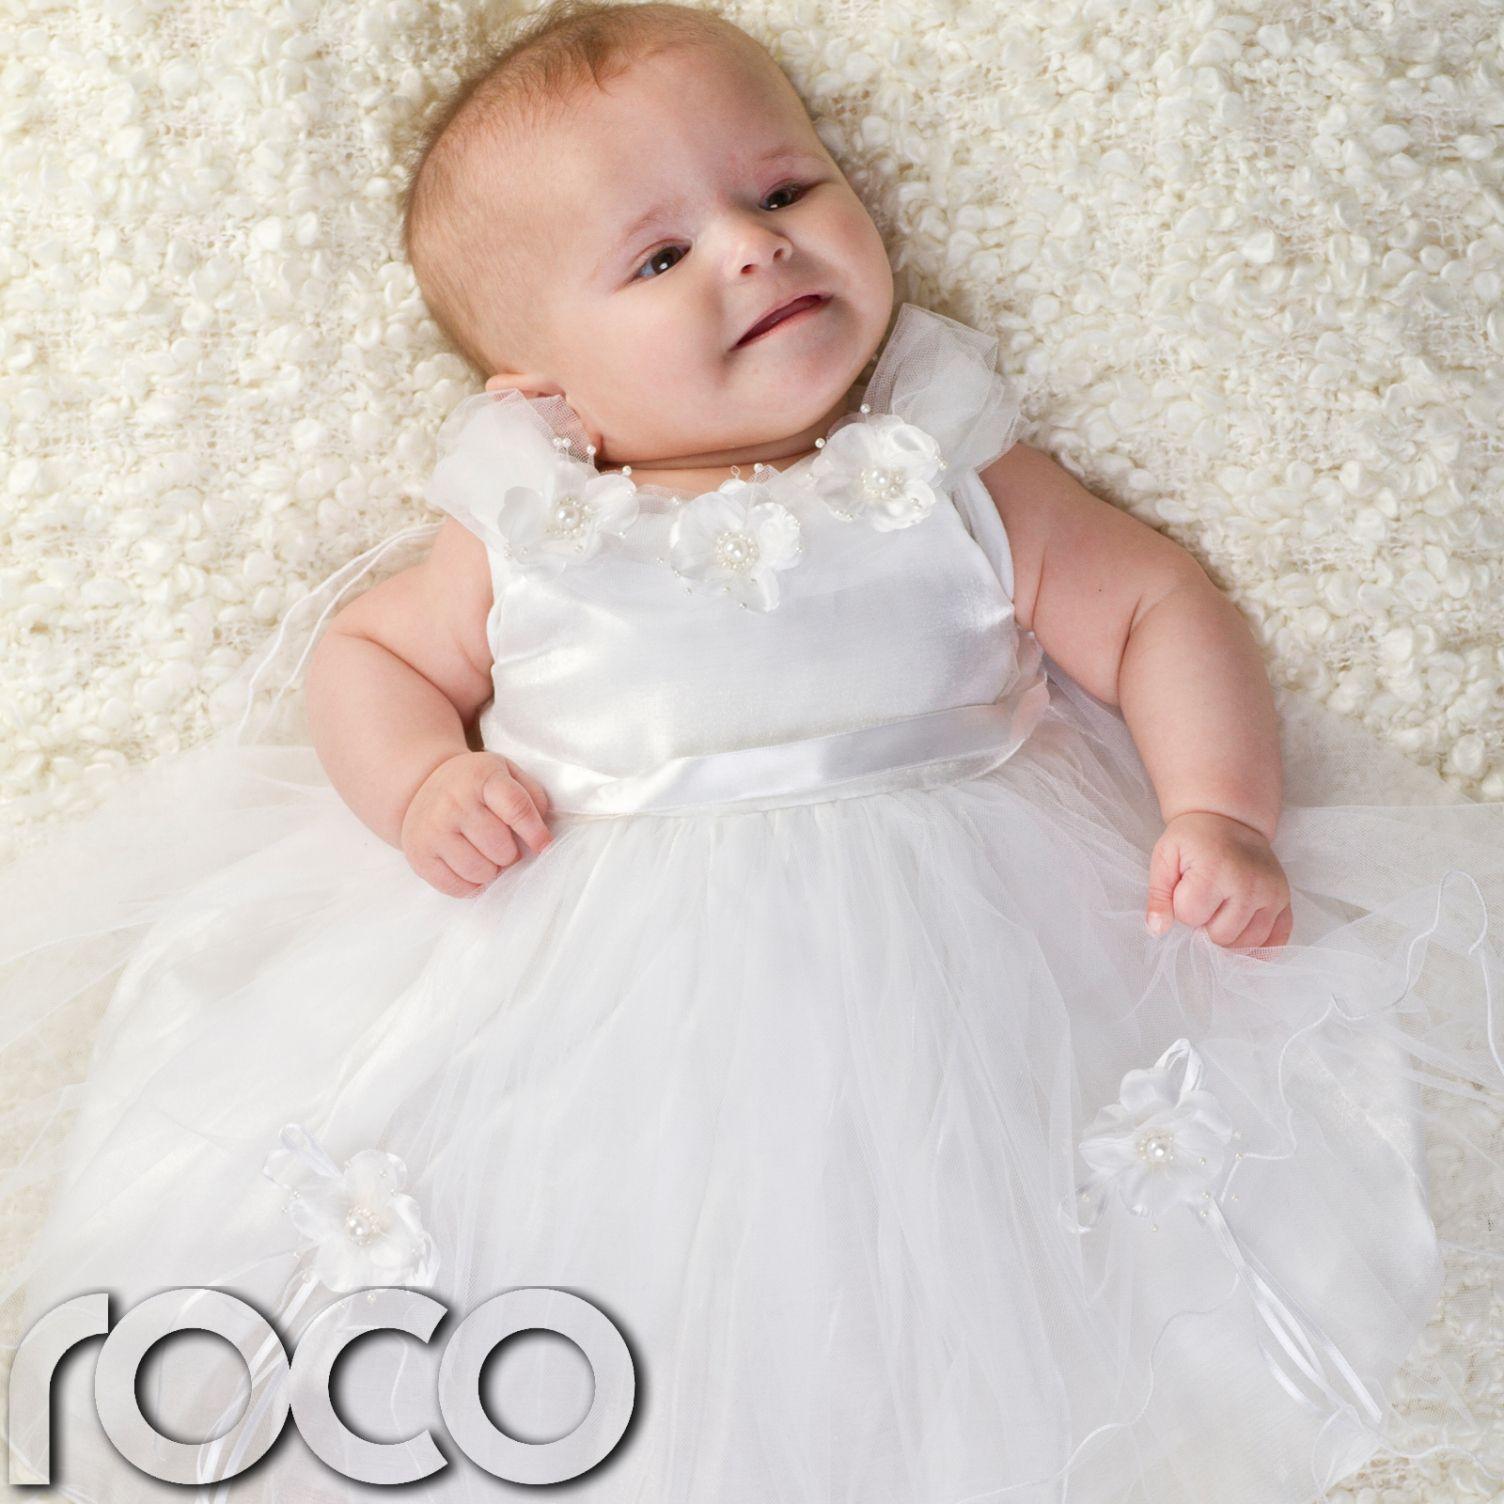 Wedding Dresses for Babies - Best Shapewear for Wedding Dress Check ...